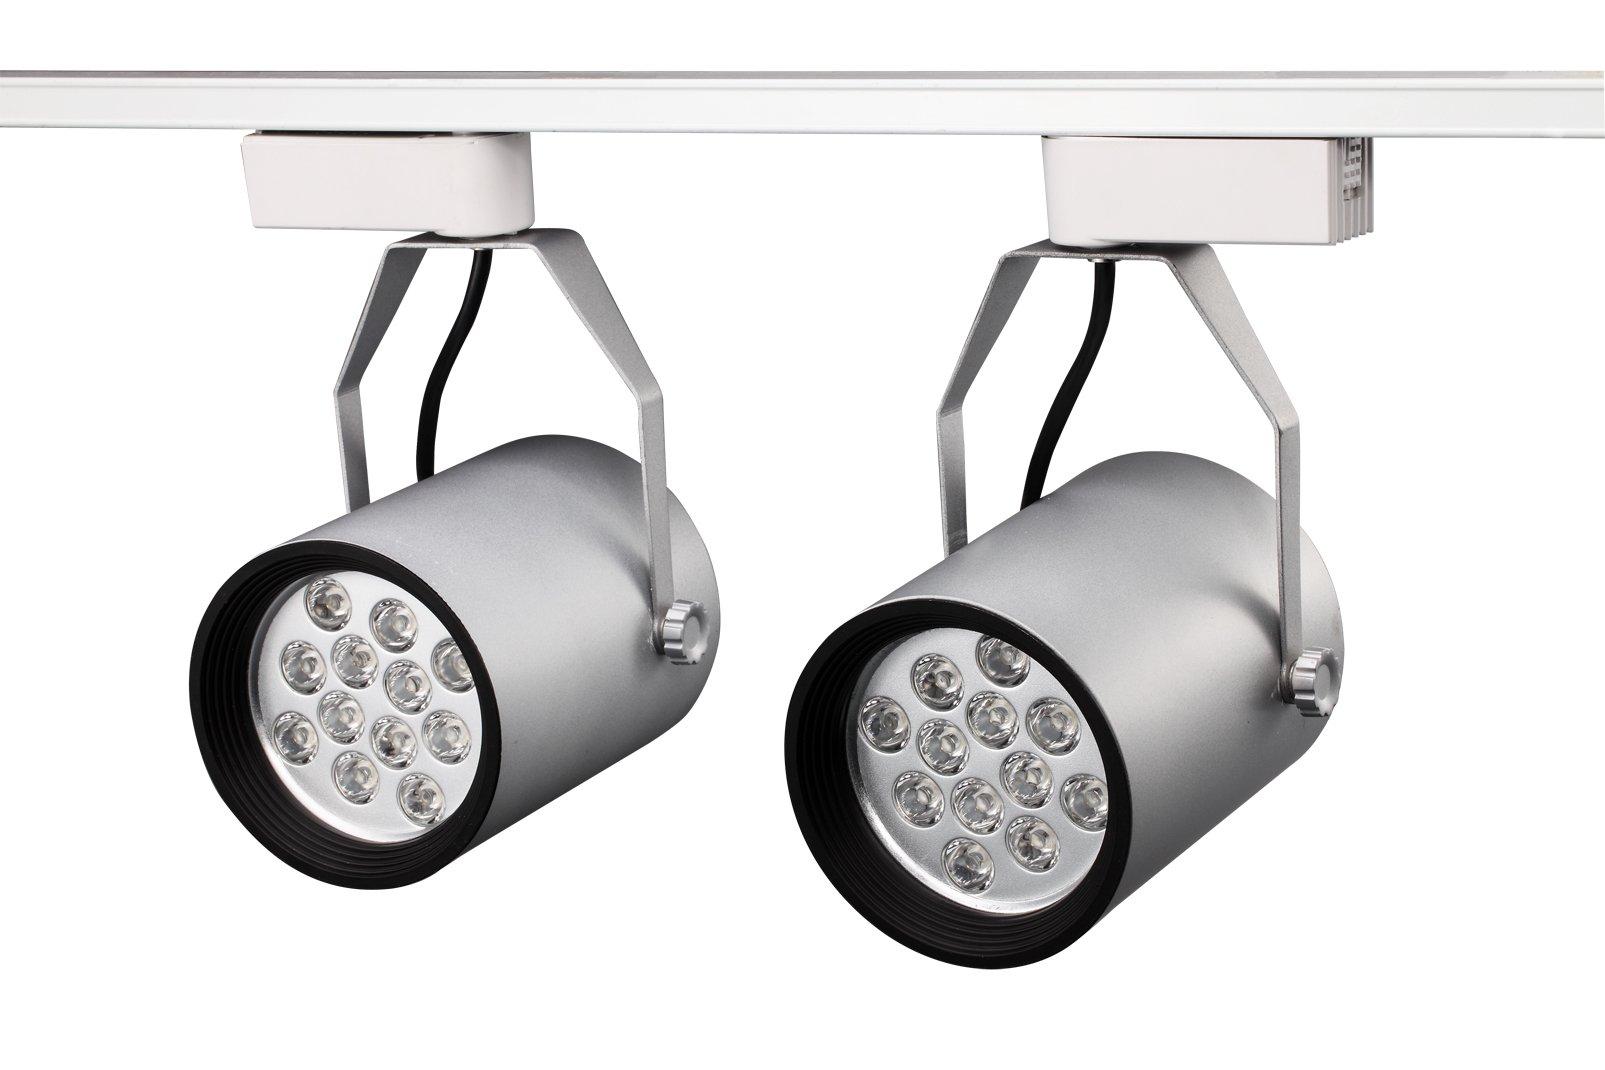 Led track light reyid peru led track light aloadofball Gallery